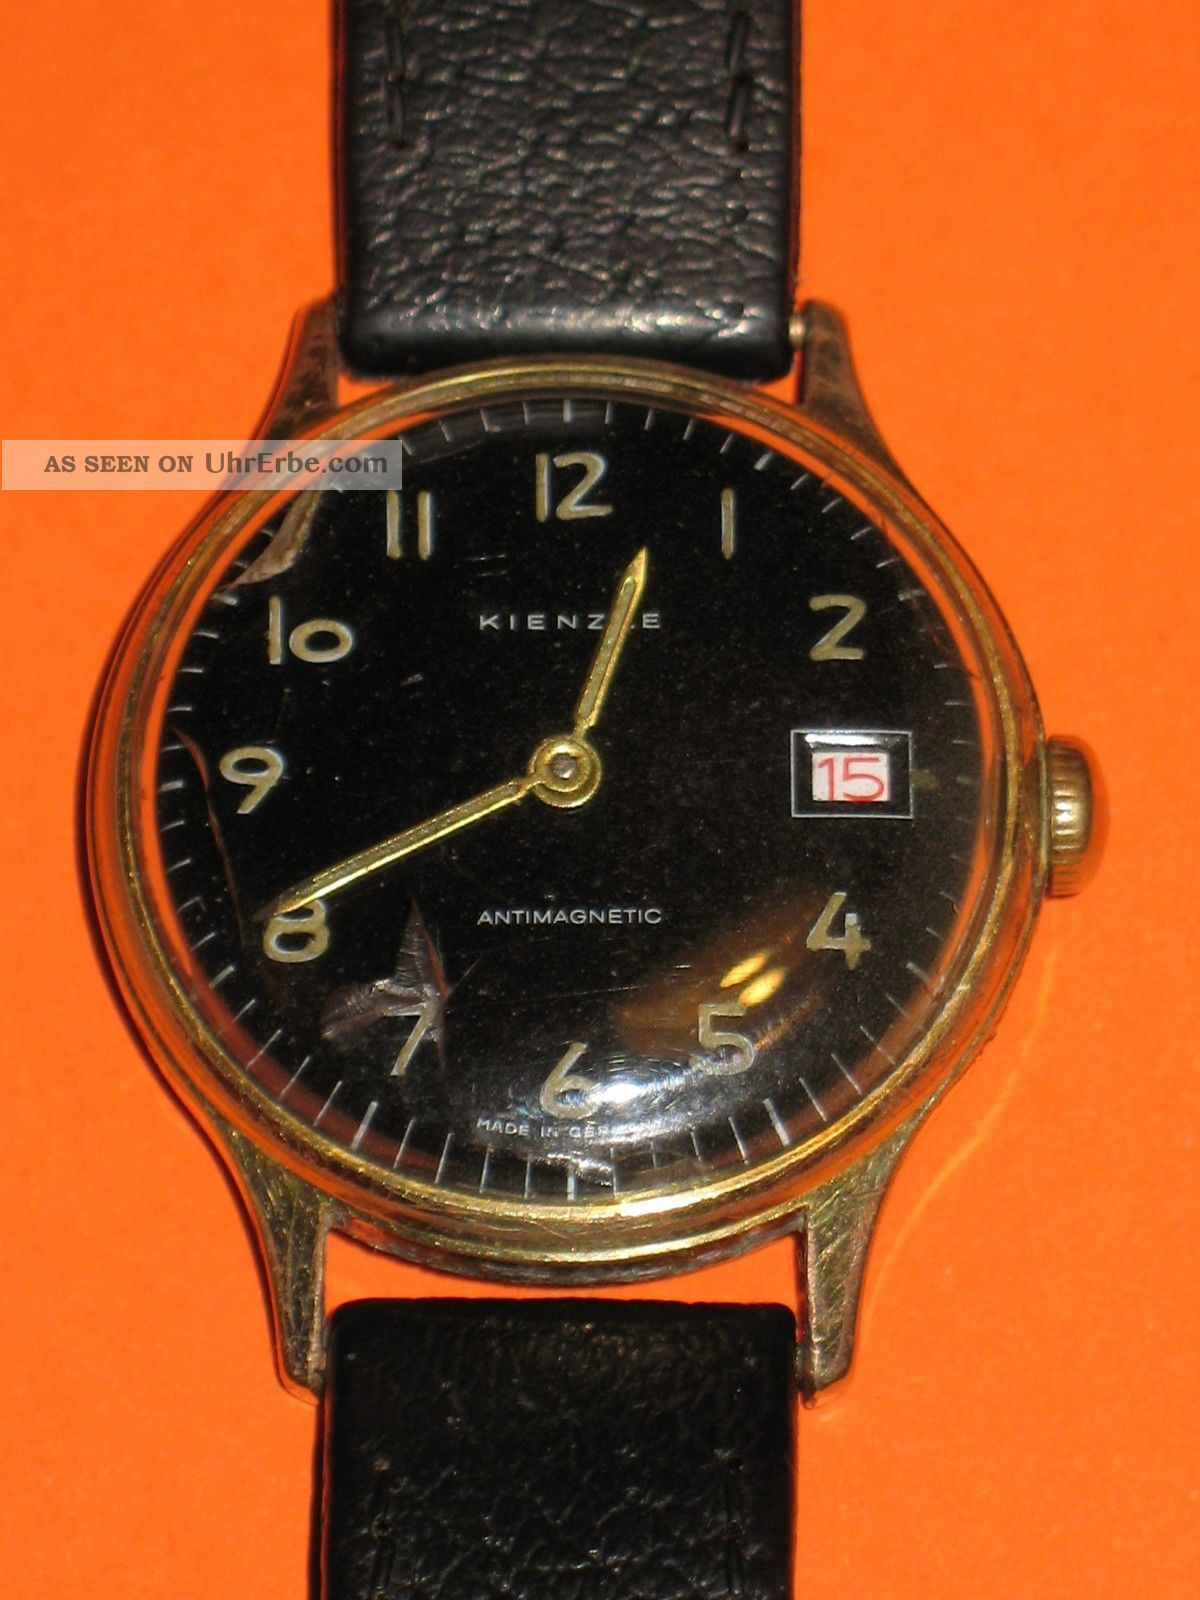 Kienzle Herrenarmbanduhr,  Kienzle - Armband Rotes Datum,  Hau Armbanduhren Bild